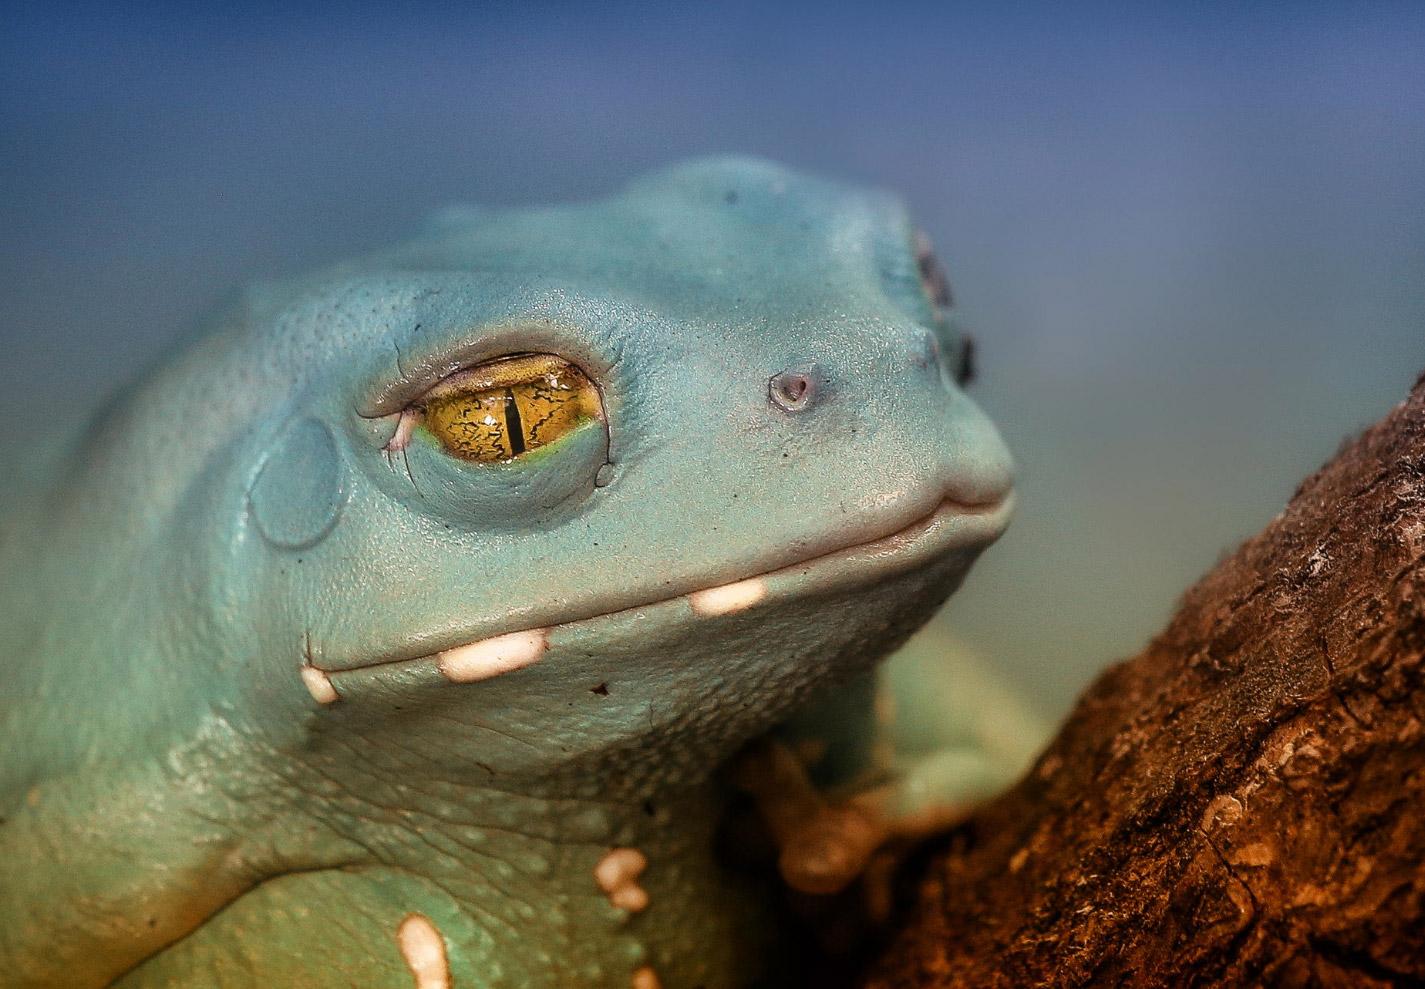 reptiles-amphibians-detlef-knapp-02